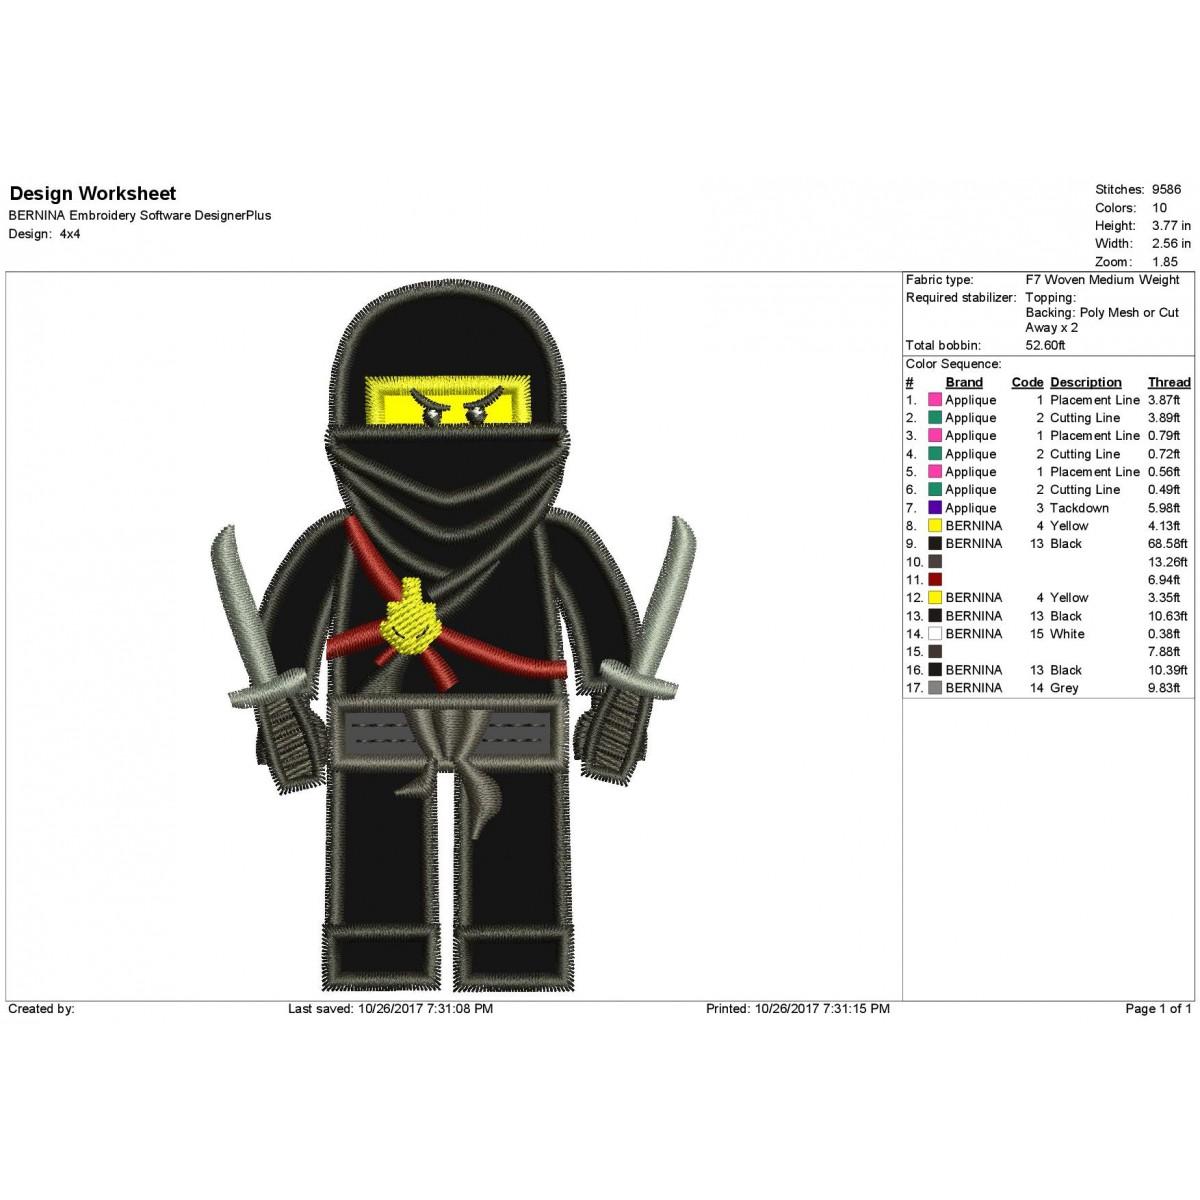 Cole Lego Ninjago Applique Design